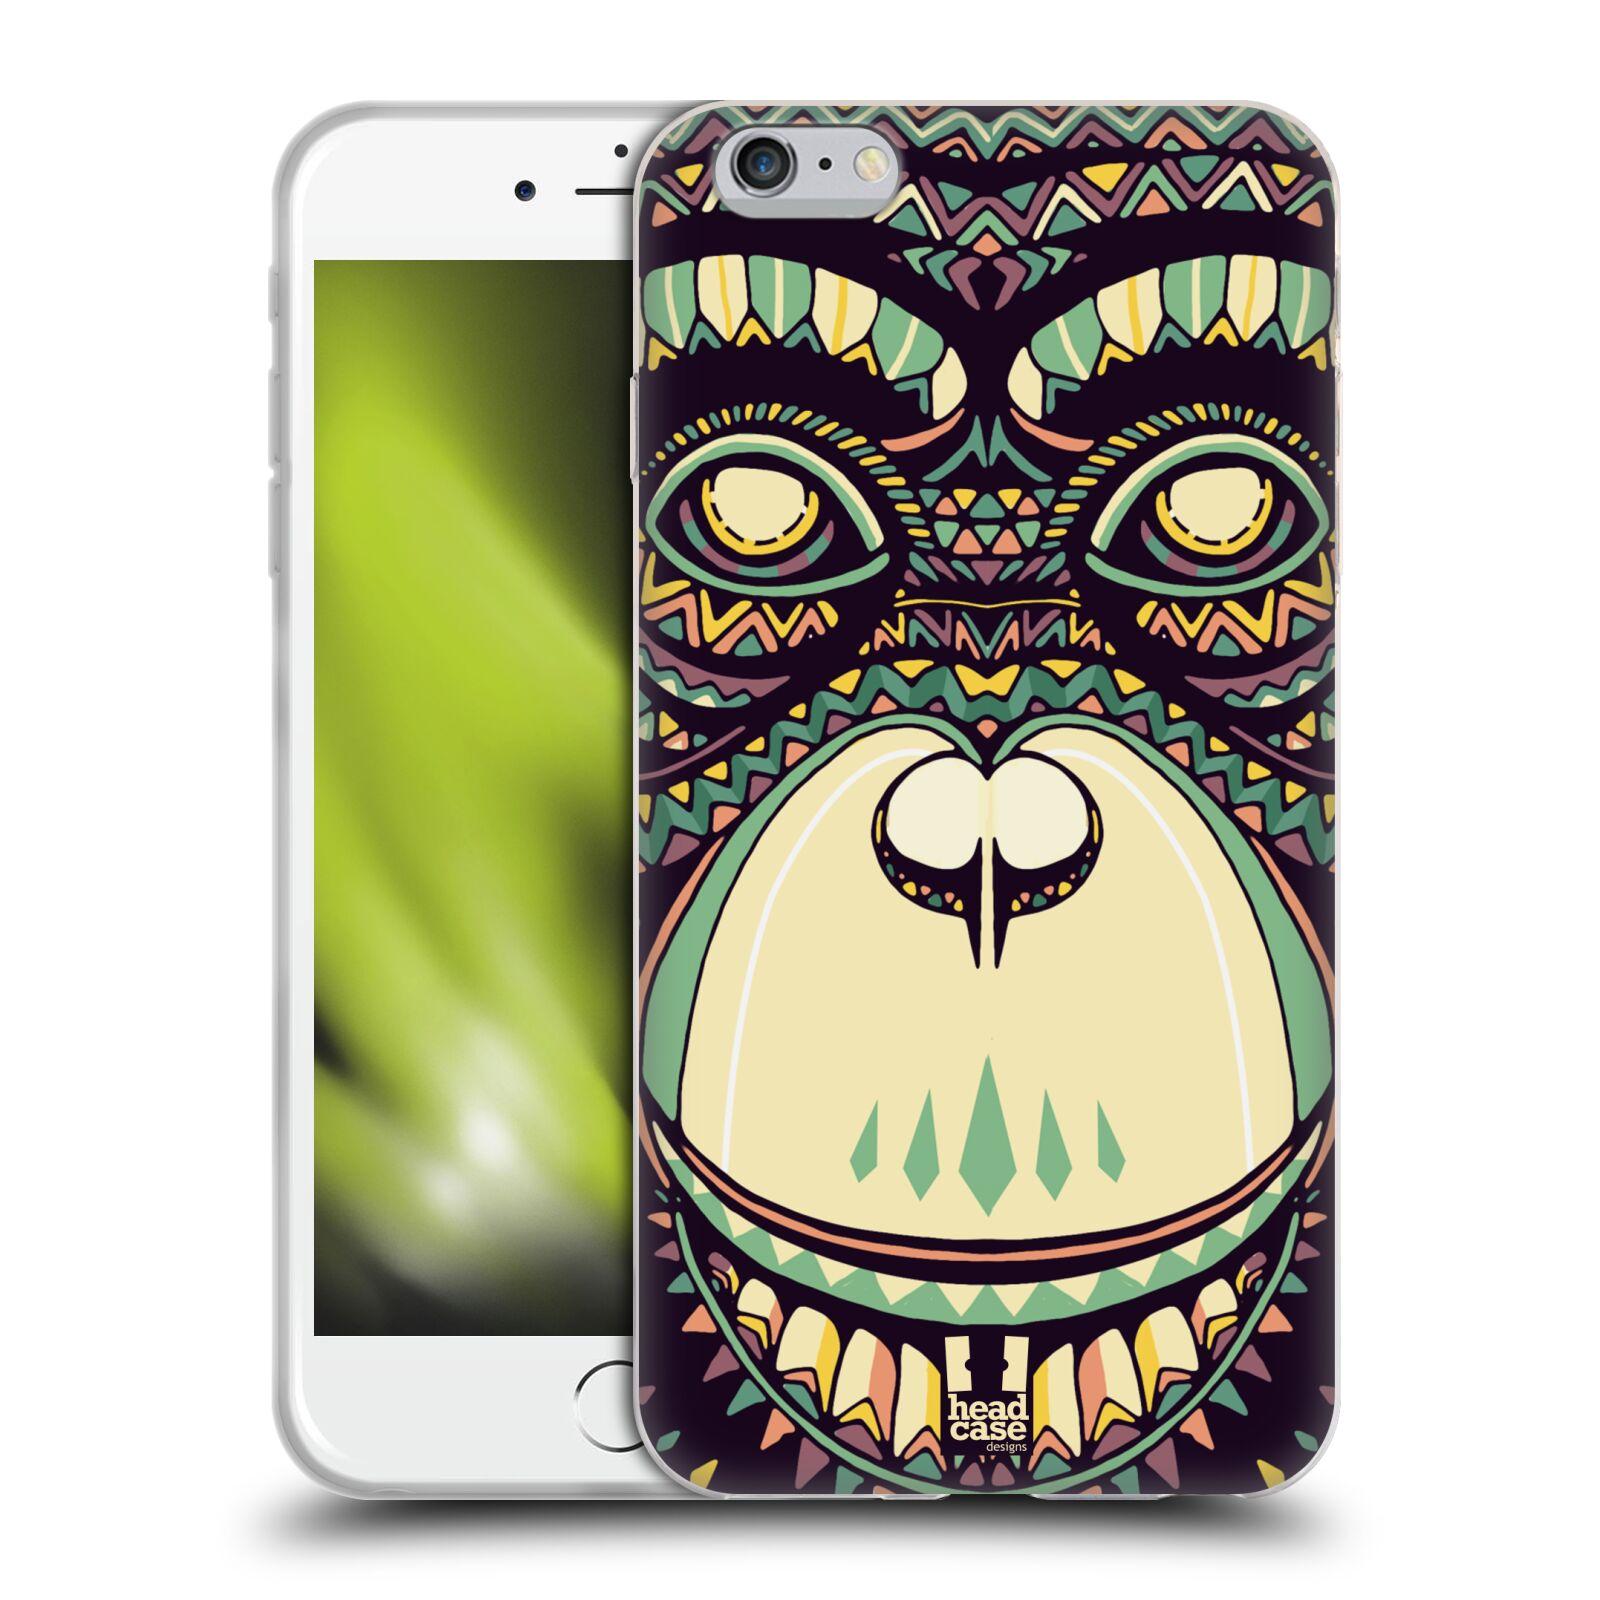 HEAD CASE silikonový obal na mobil Apple Iphone 6 PLUS/ 6S PLUS vzor Aztécký motiv zvíře 3 šimpanz